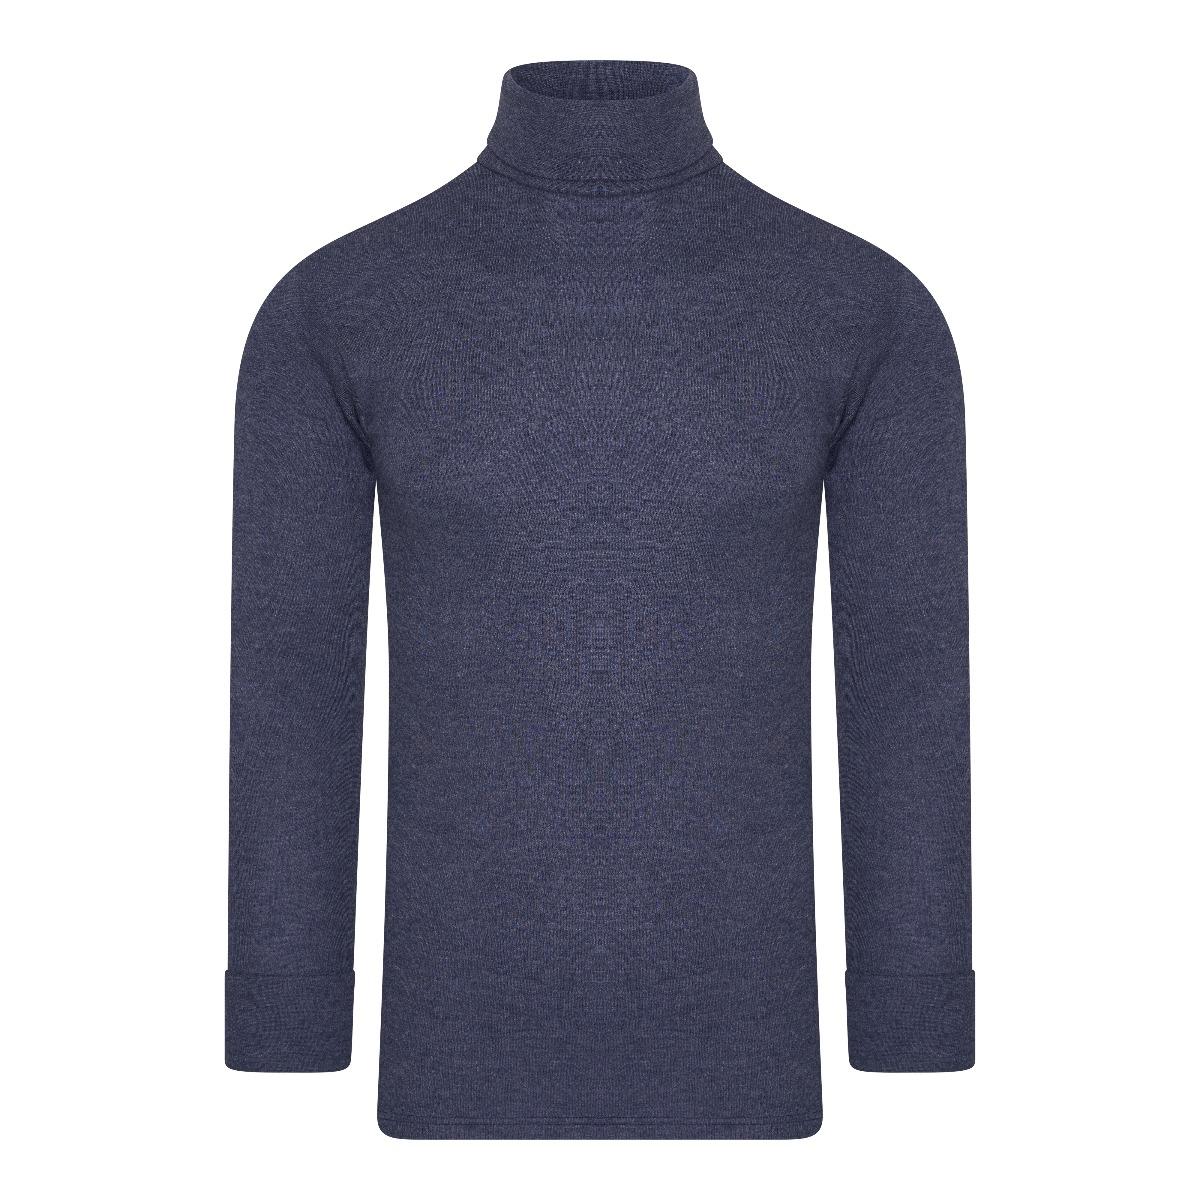 Beeren Thermo Unisex Shirt Col Lange Mouw Marine XL